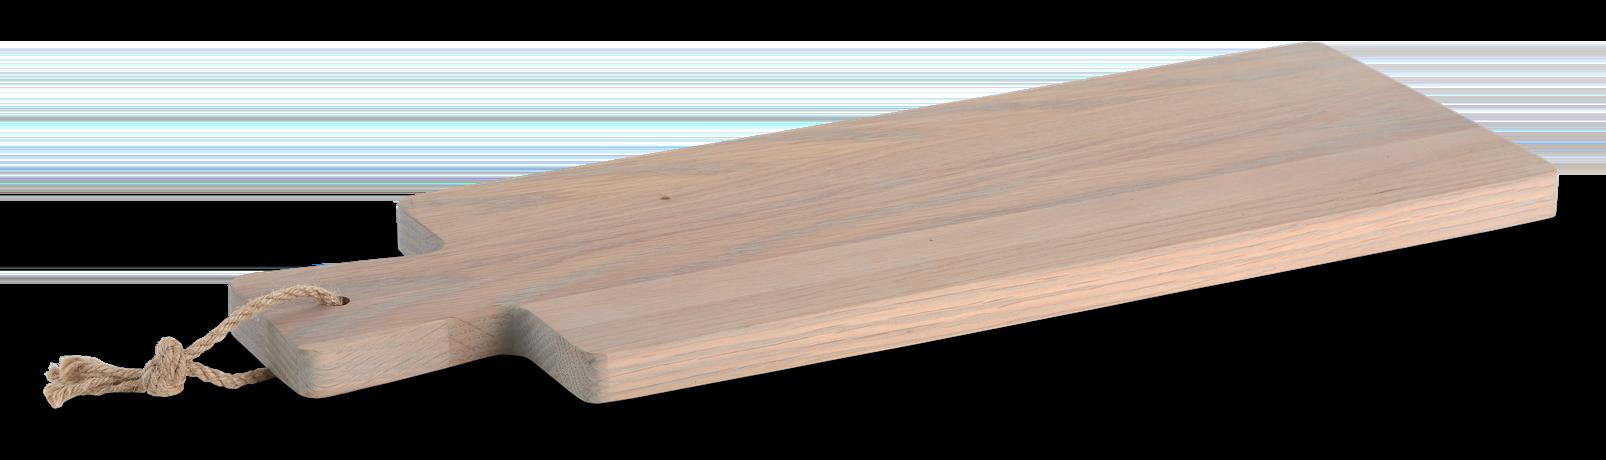 Borough Long Oak Chopping Board Seasoned Oak_3Quarter